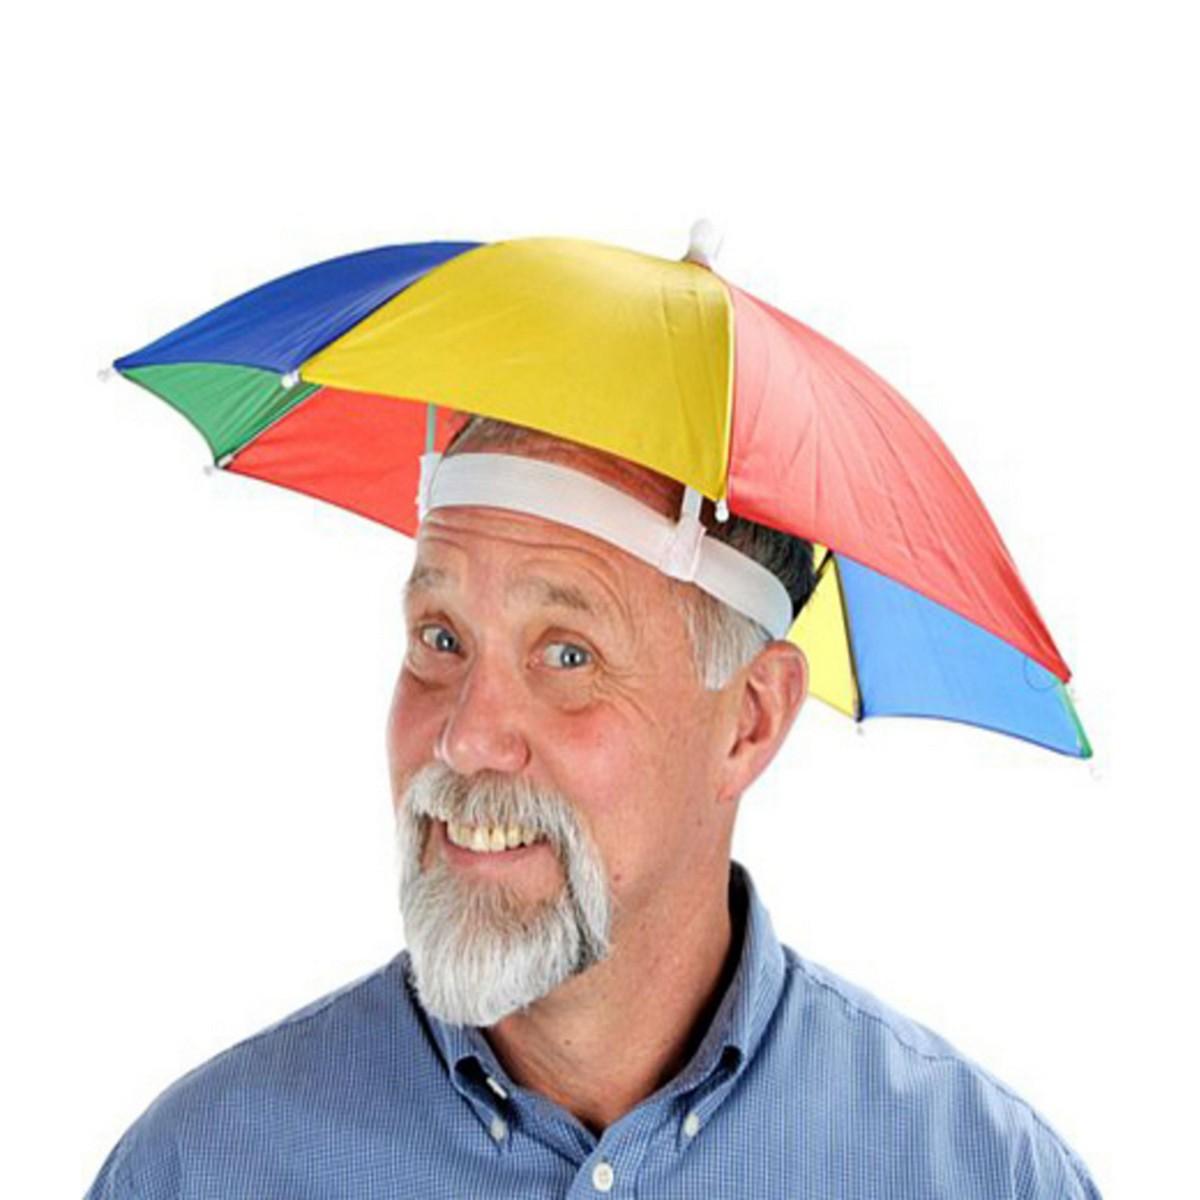 Hat Umbrella